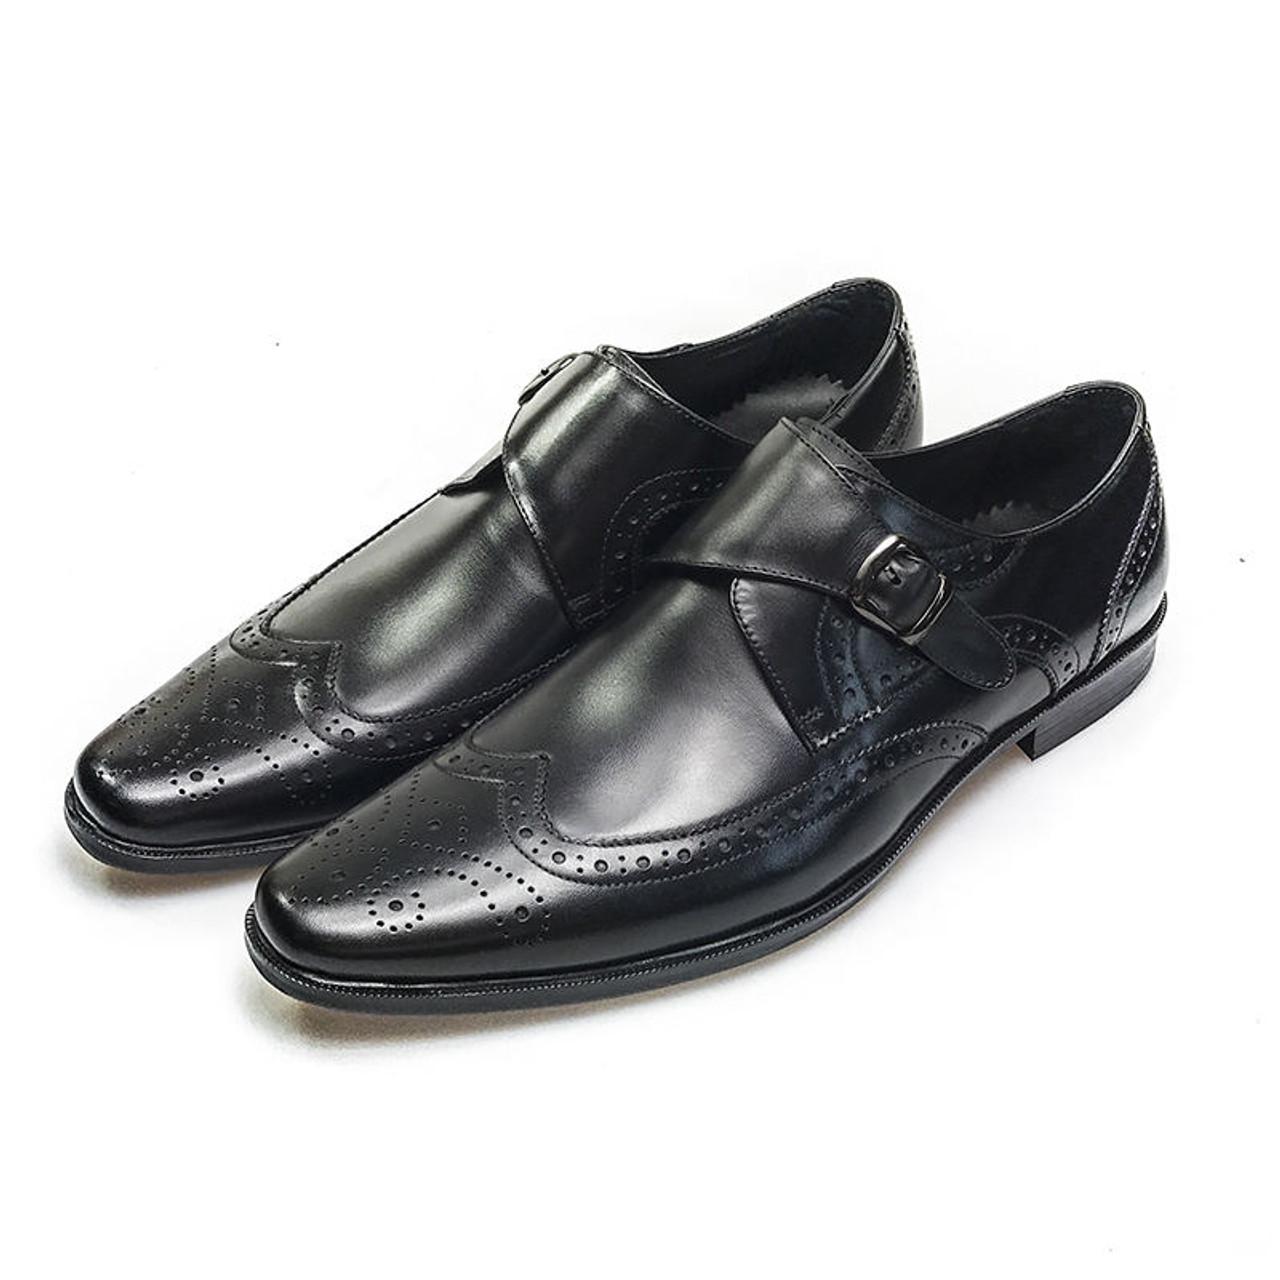 Trendy Men's Side Buckle Shoes Online